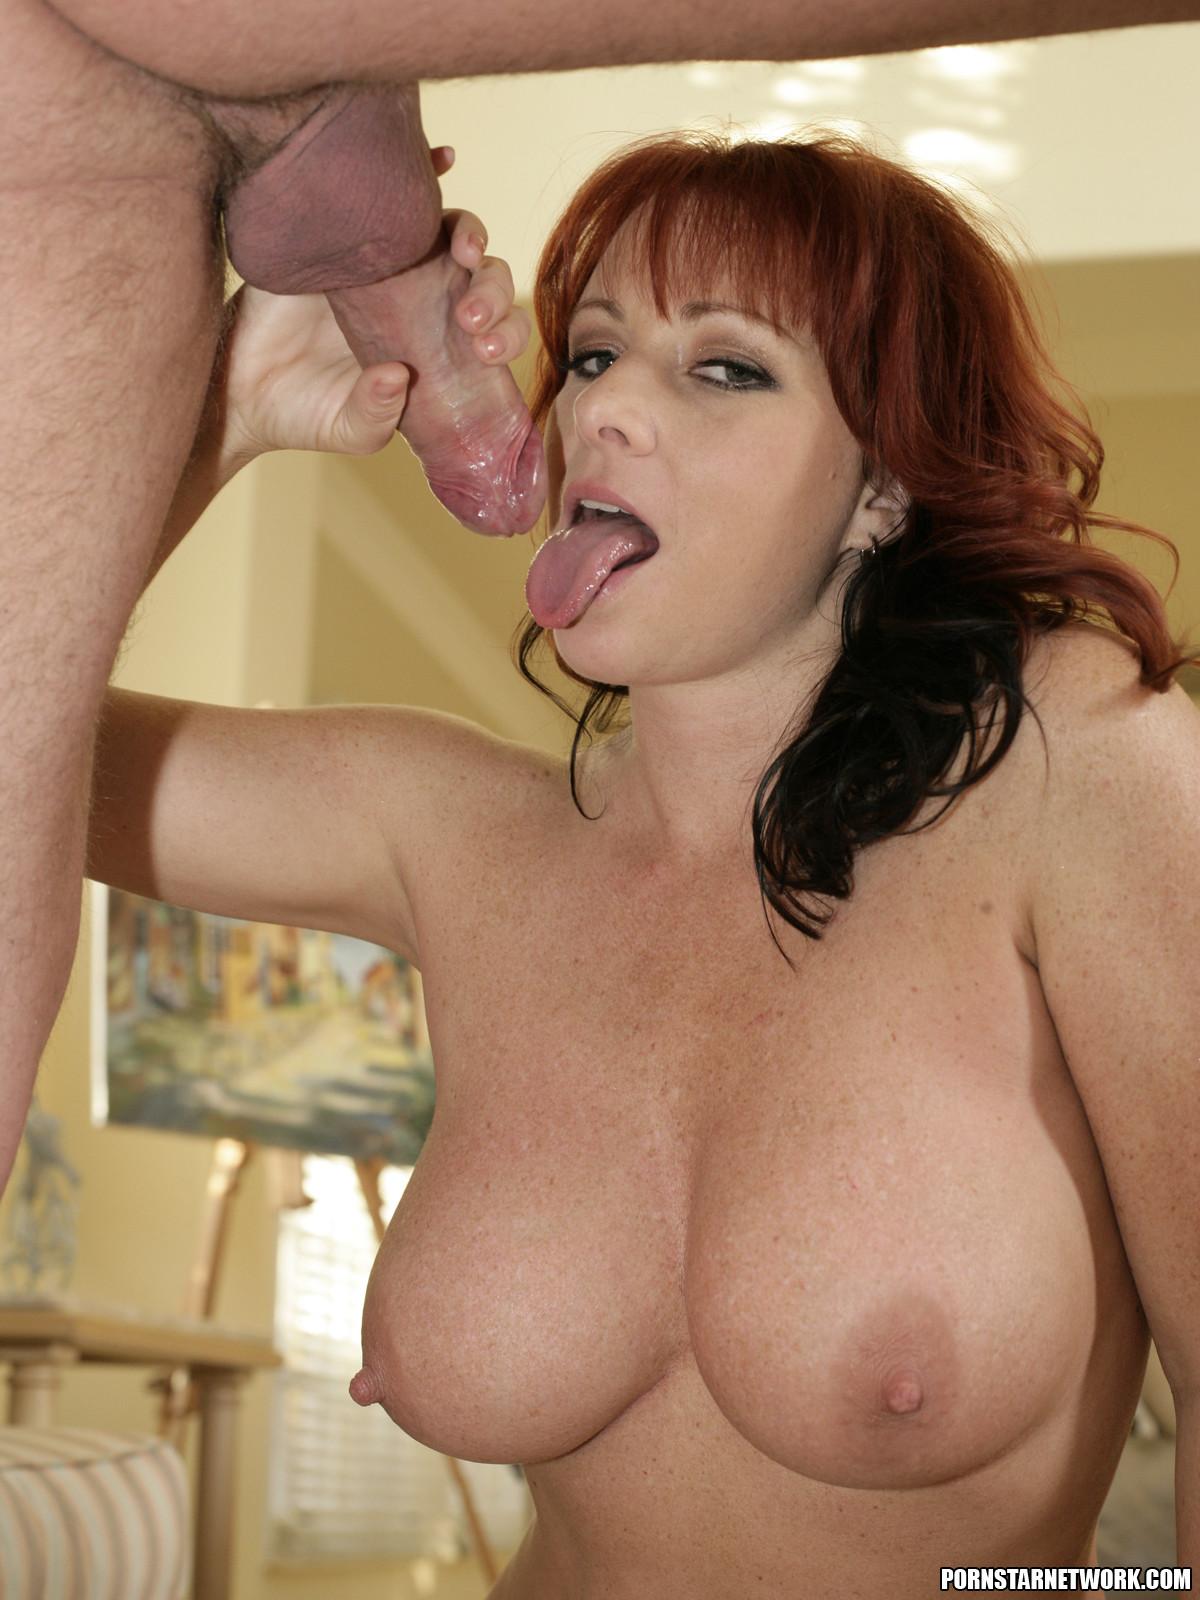 Hot redhead cougar kylie ireland anal threeway - 2 part 1